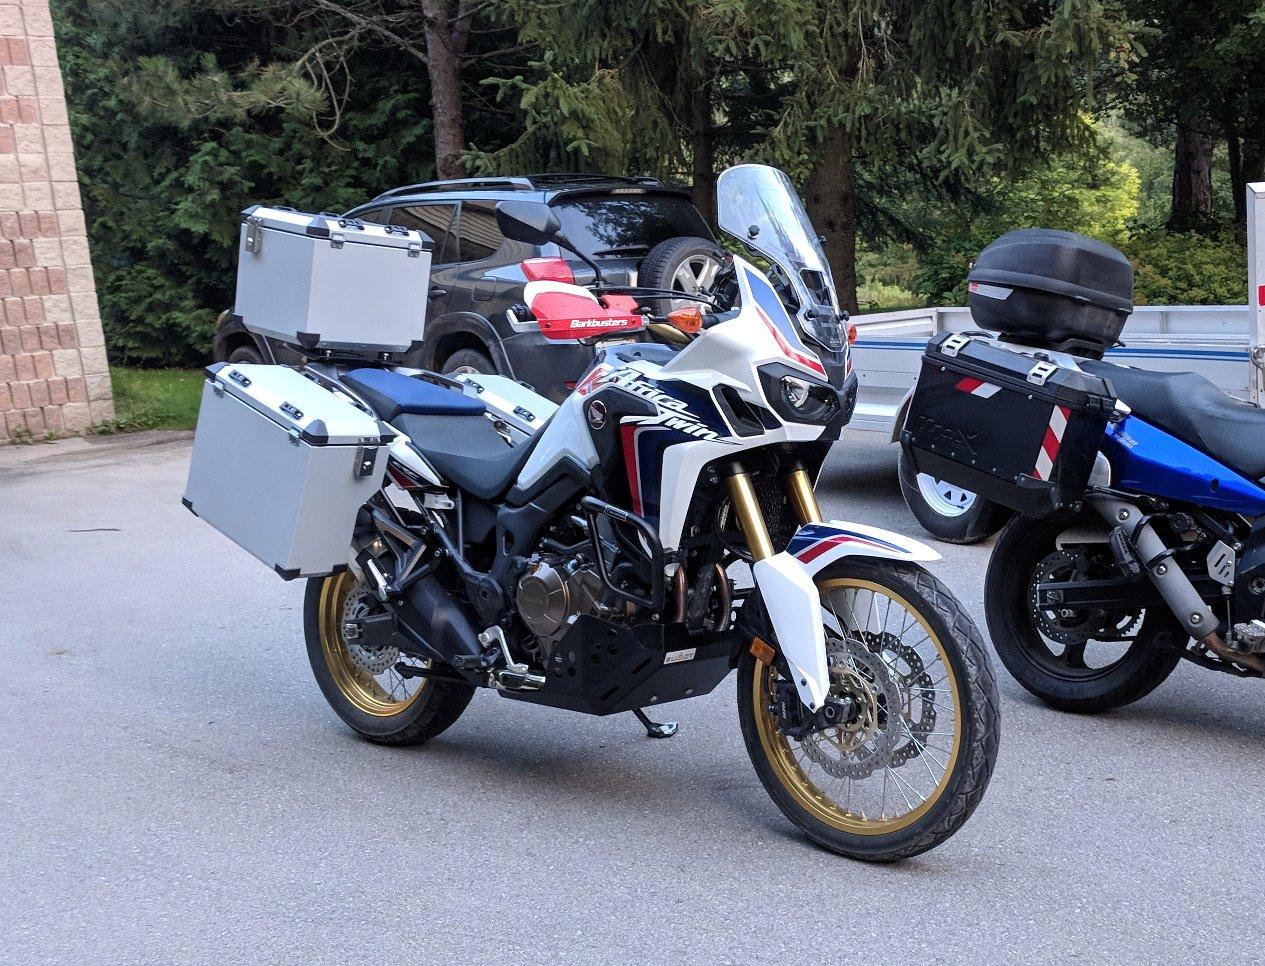 Bumot, Jesse, or Touratech Zega? - Honda CRF1000L Africa